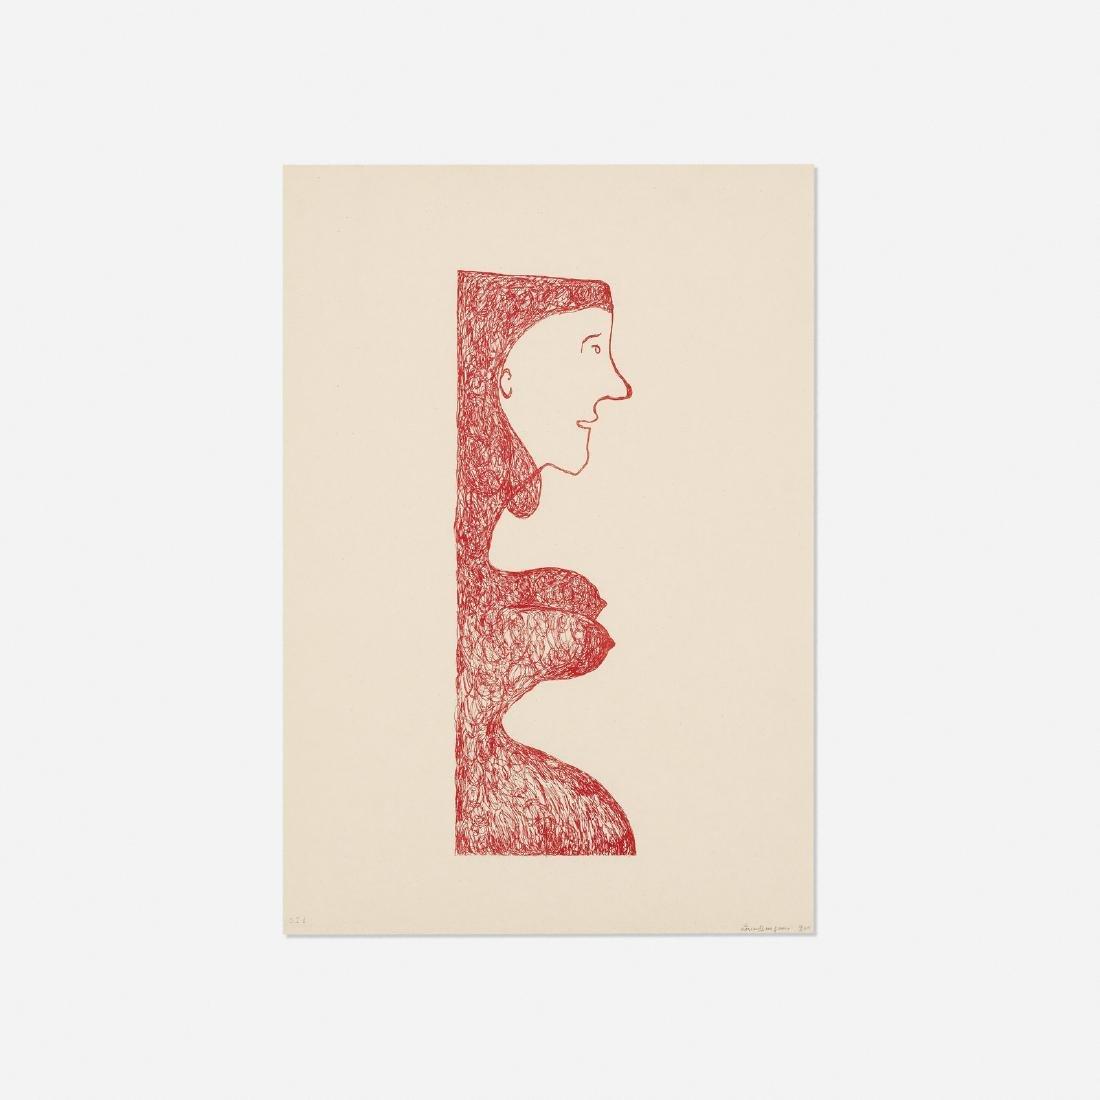 Louise Bourgeois, Pregnant Caryatid